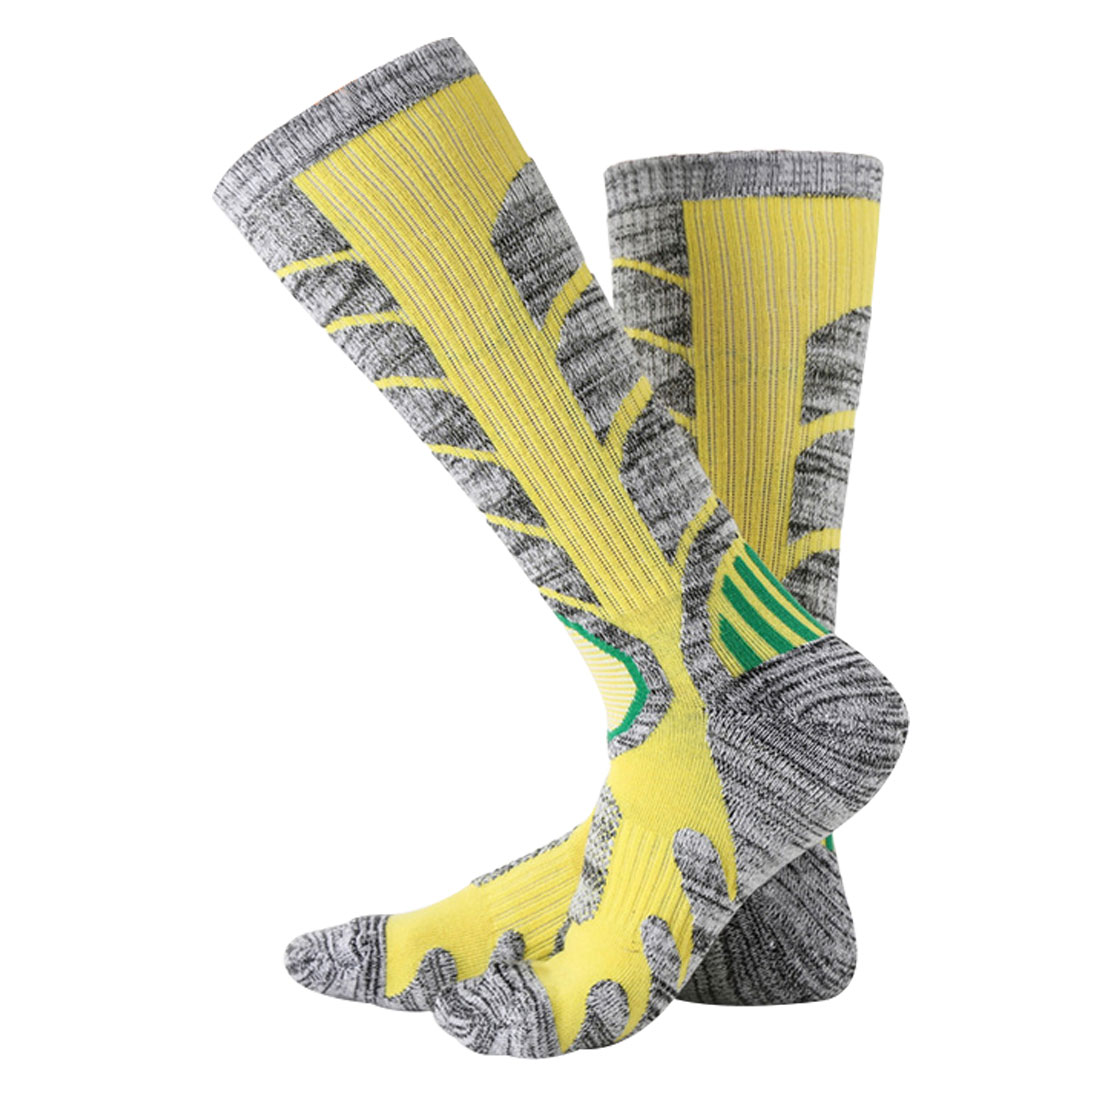 Hot Sell Men Women Thermal Ski Socks Thick Cotton Sports Snowboard Cycling Skiing Soccer Socks Leg Warmers Long Socks